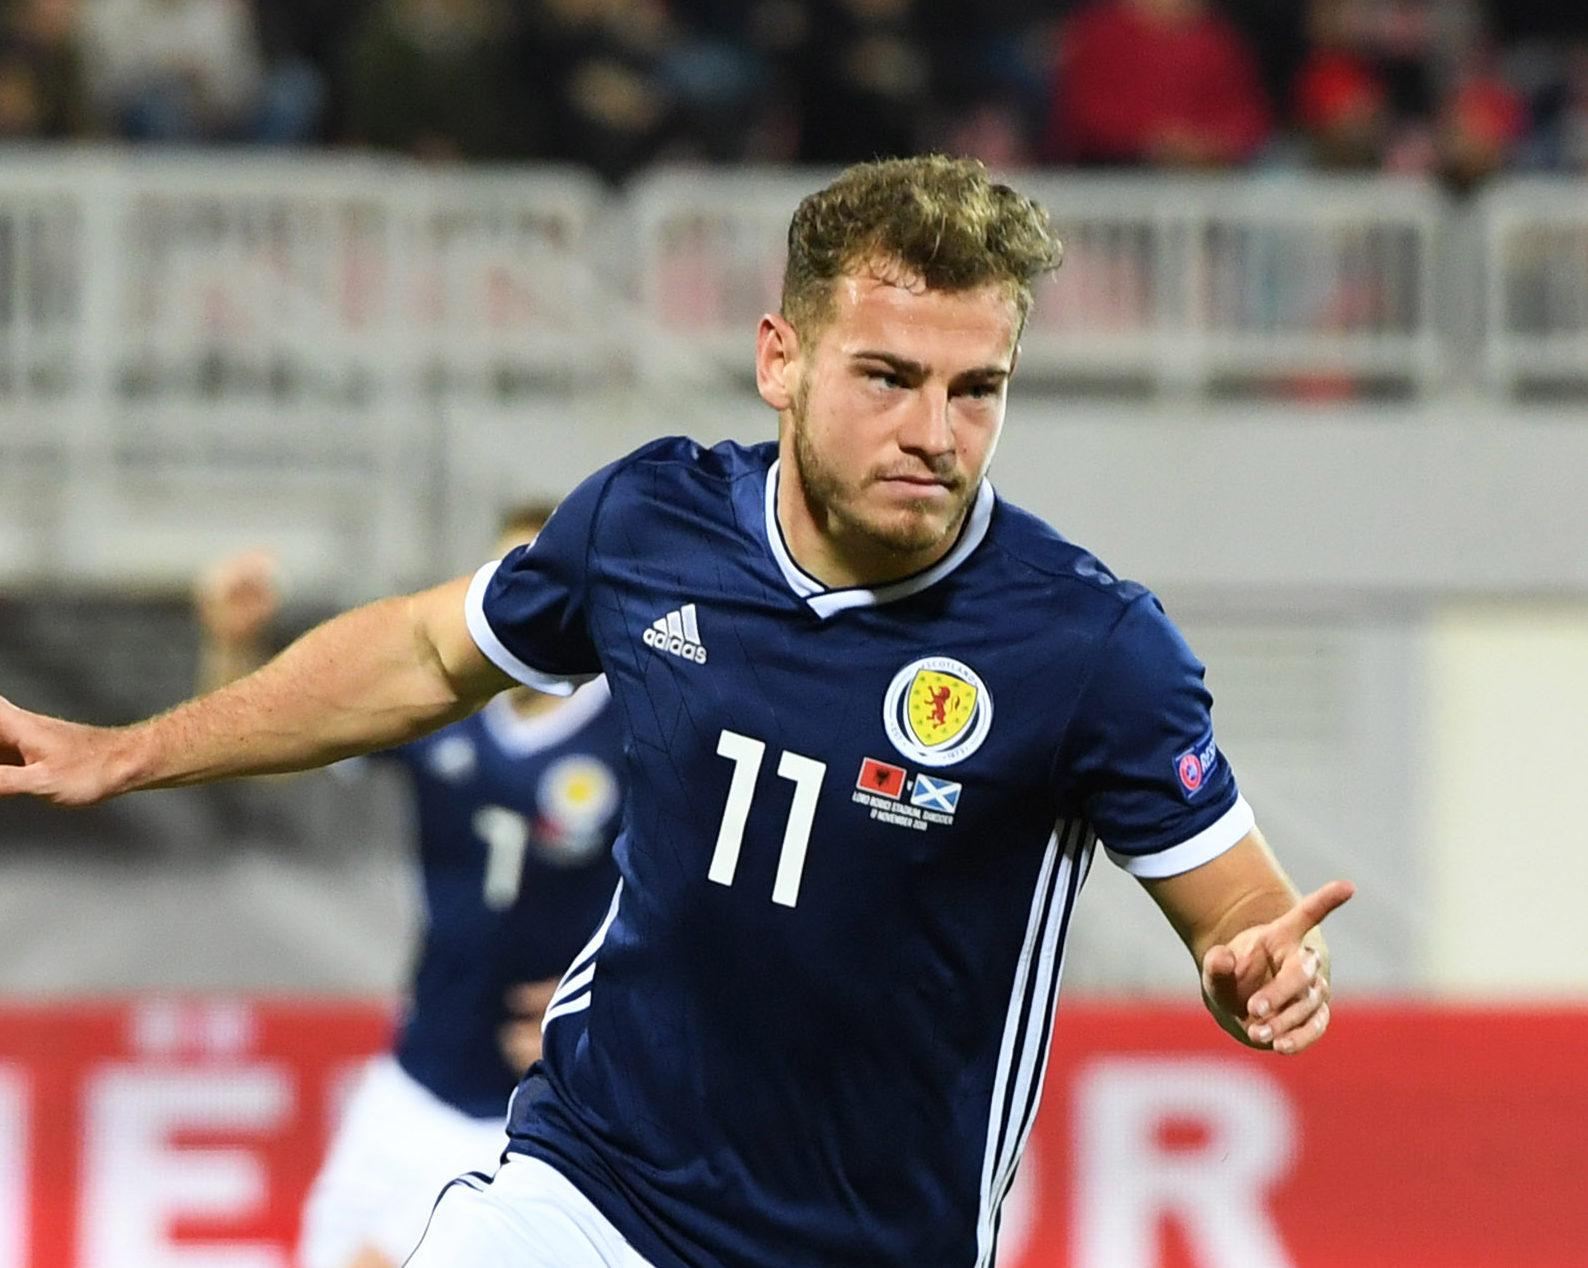 Scotland's Ryan Fraser